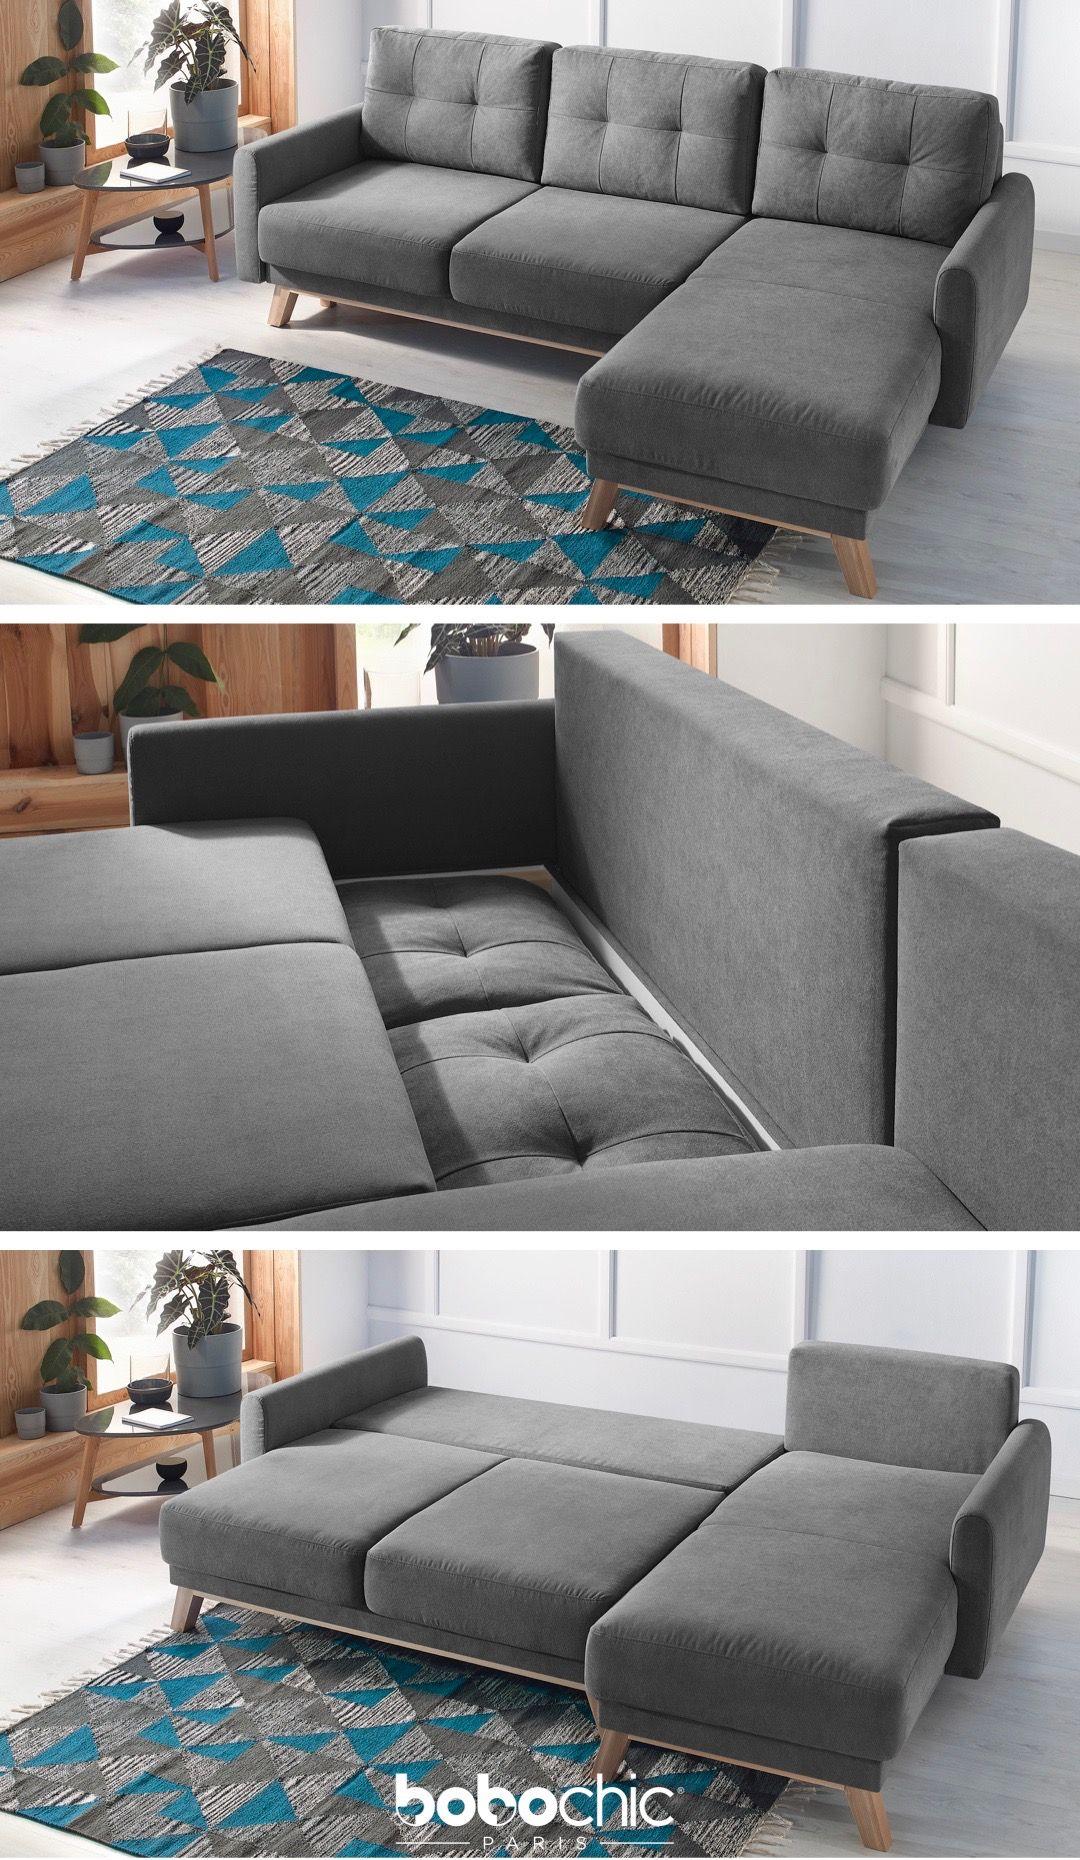 Balio Canape D Angle Convertible Avec Coffre Gris Bobochic Salon Living Room Grey Couch Tapis Canape Angle Canape Angle Convertible Decoration Interieur Design